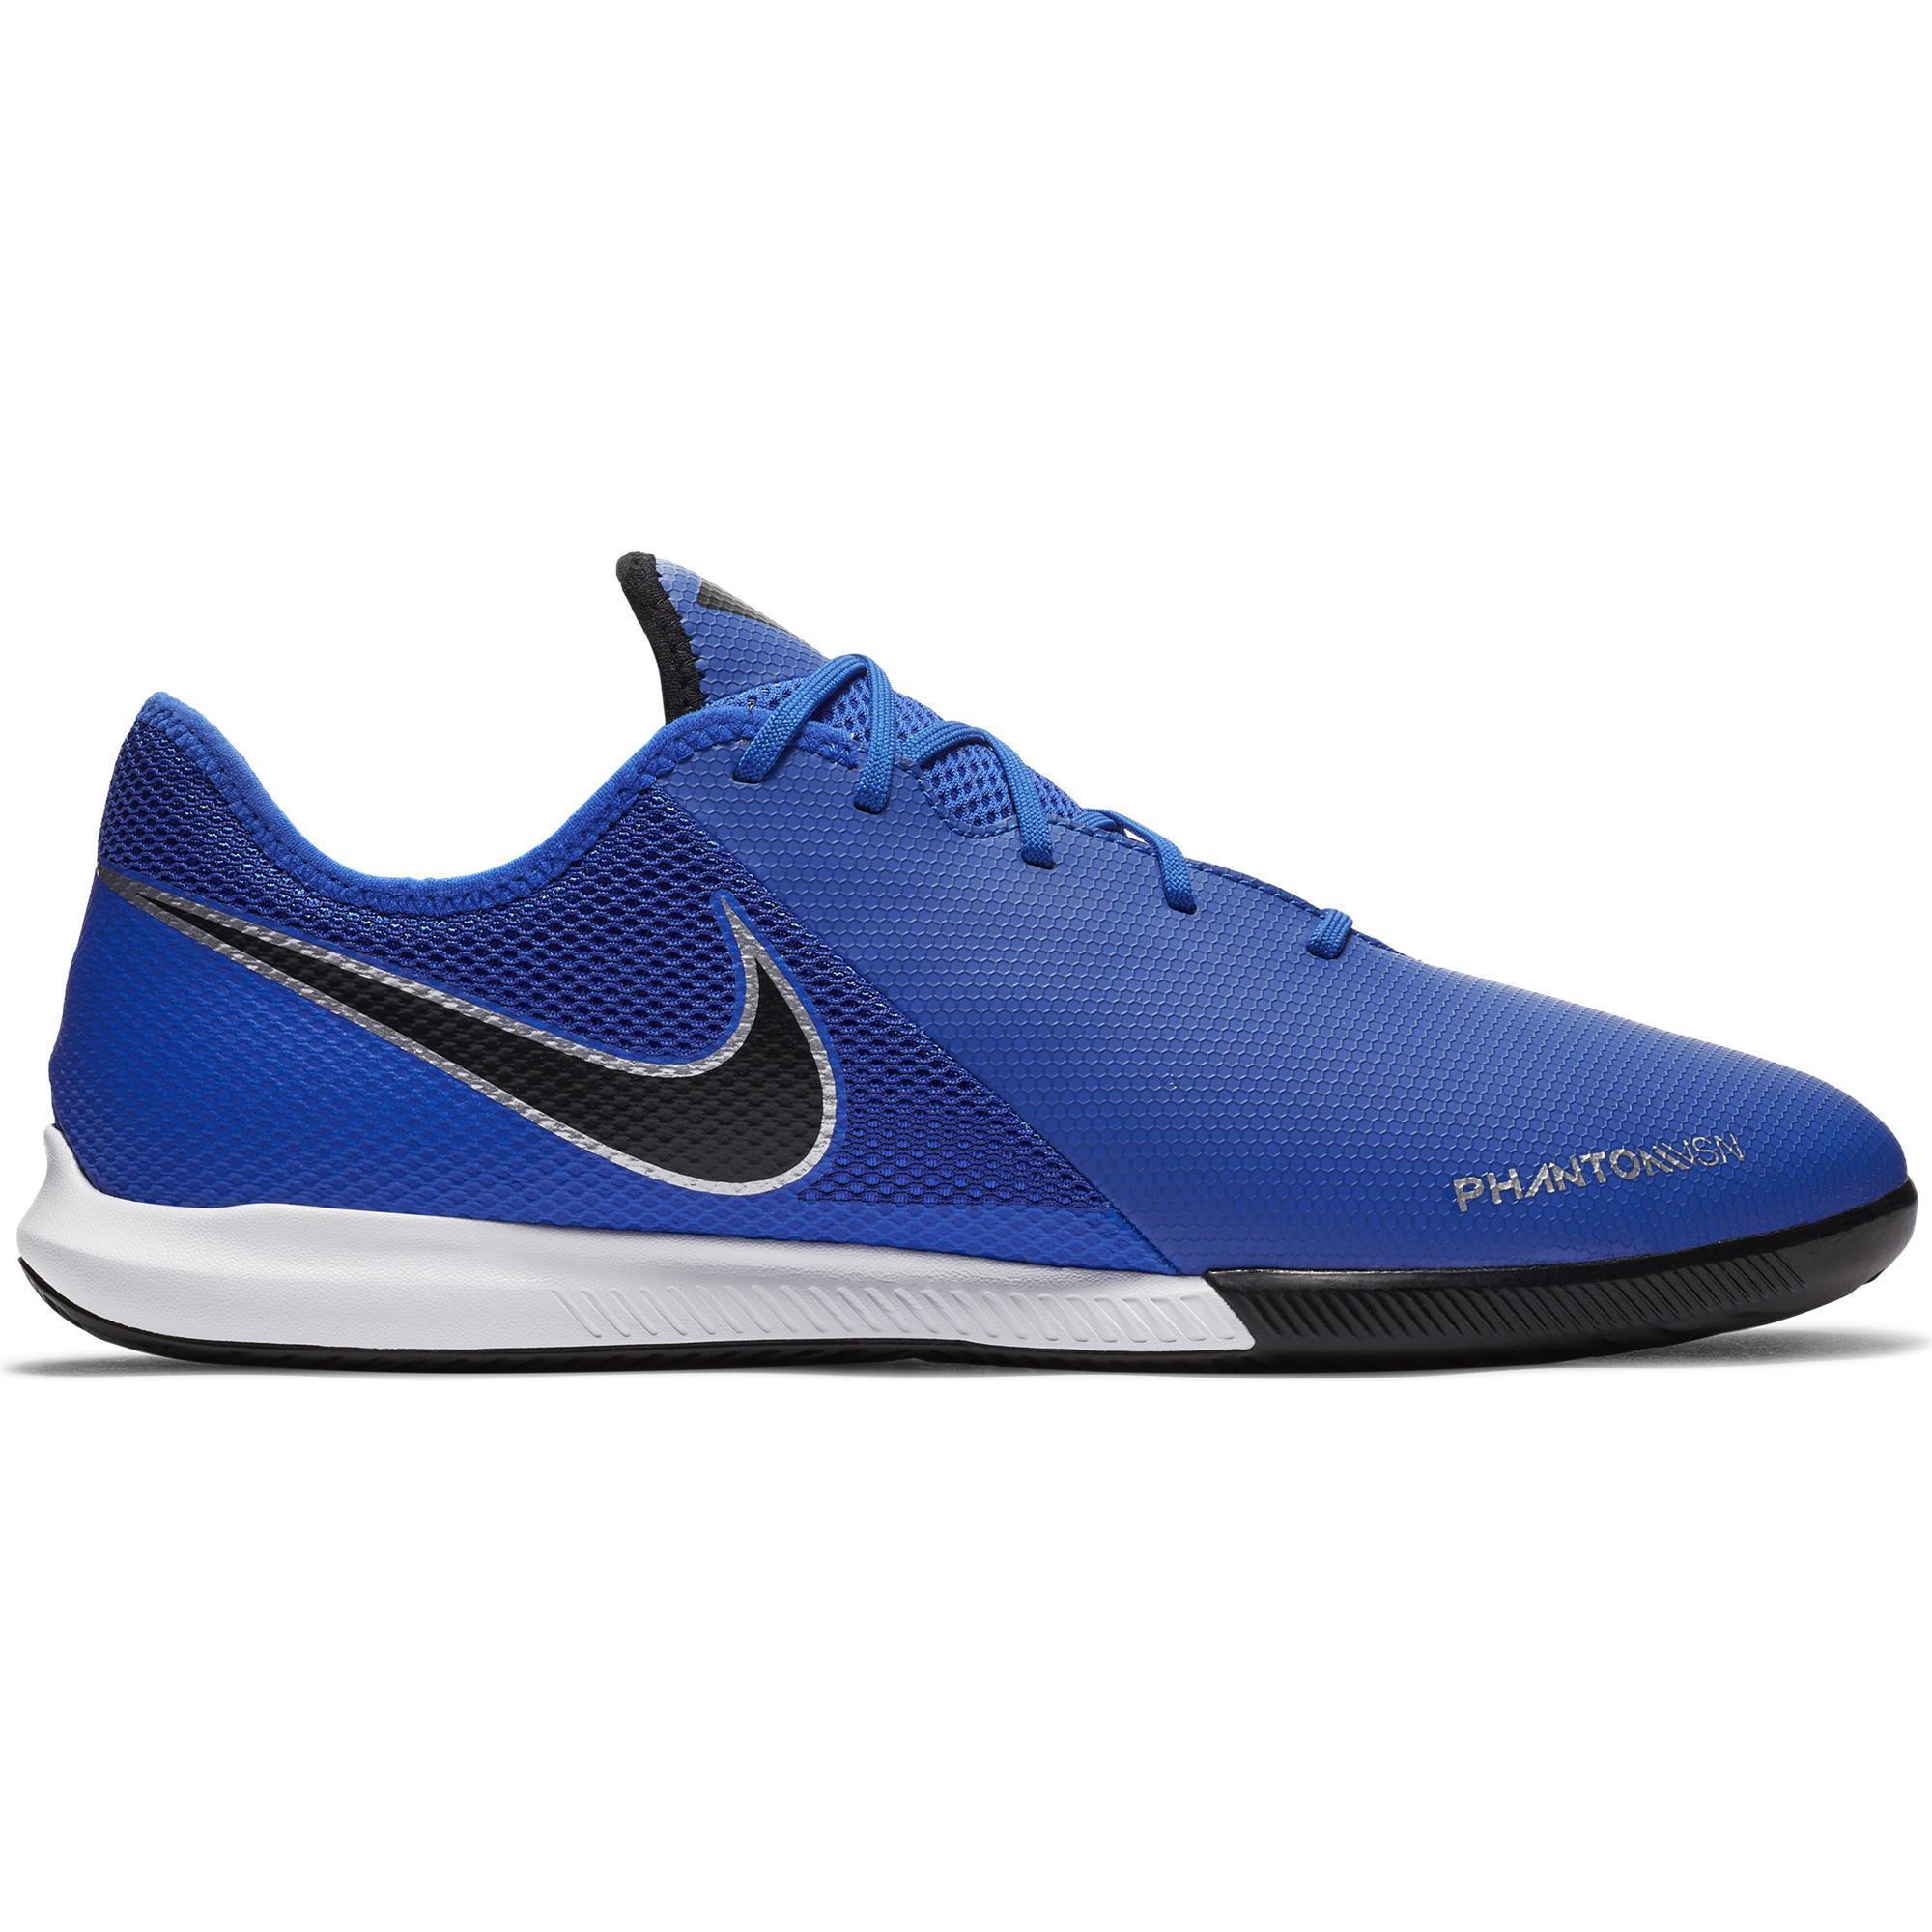 Nike Zaalvoetbalschoenen Phantom Vision Academy Dynamic Fit IC blauw